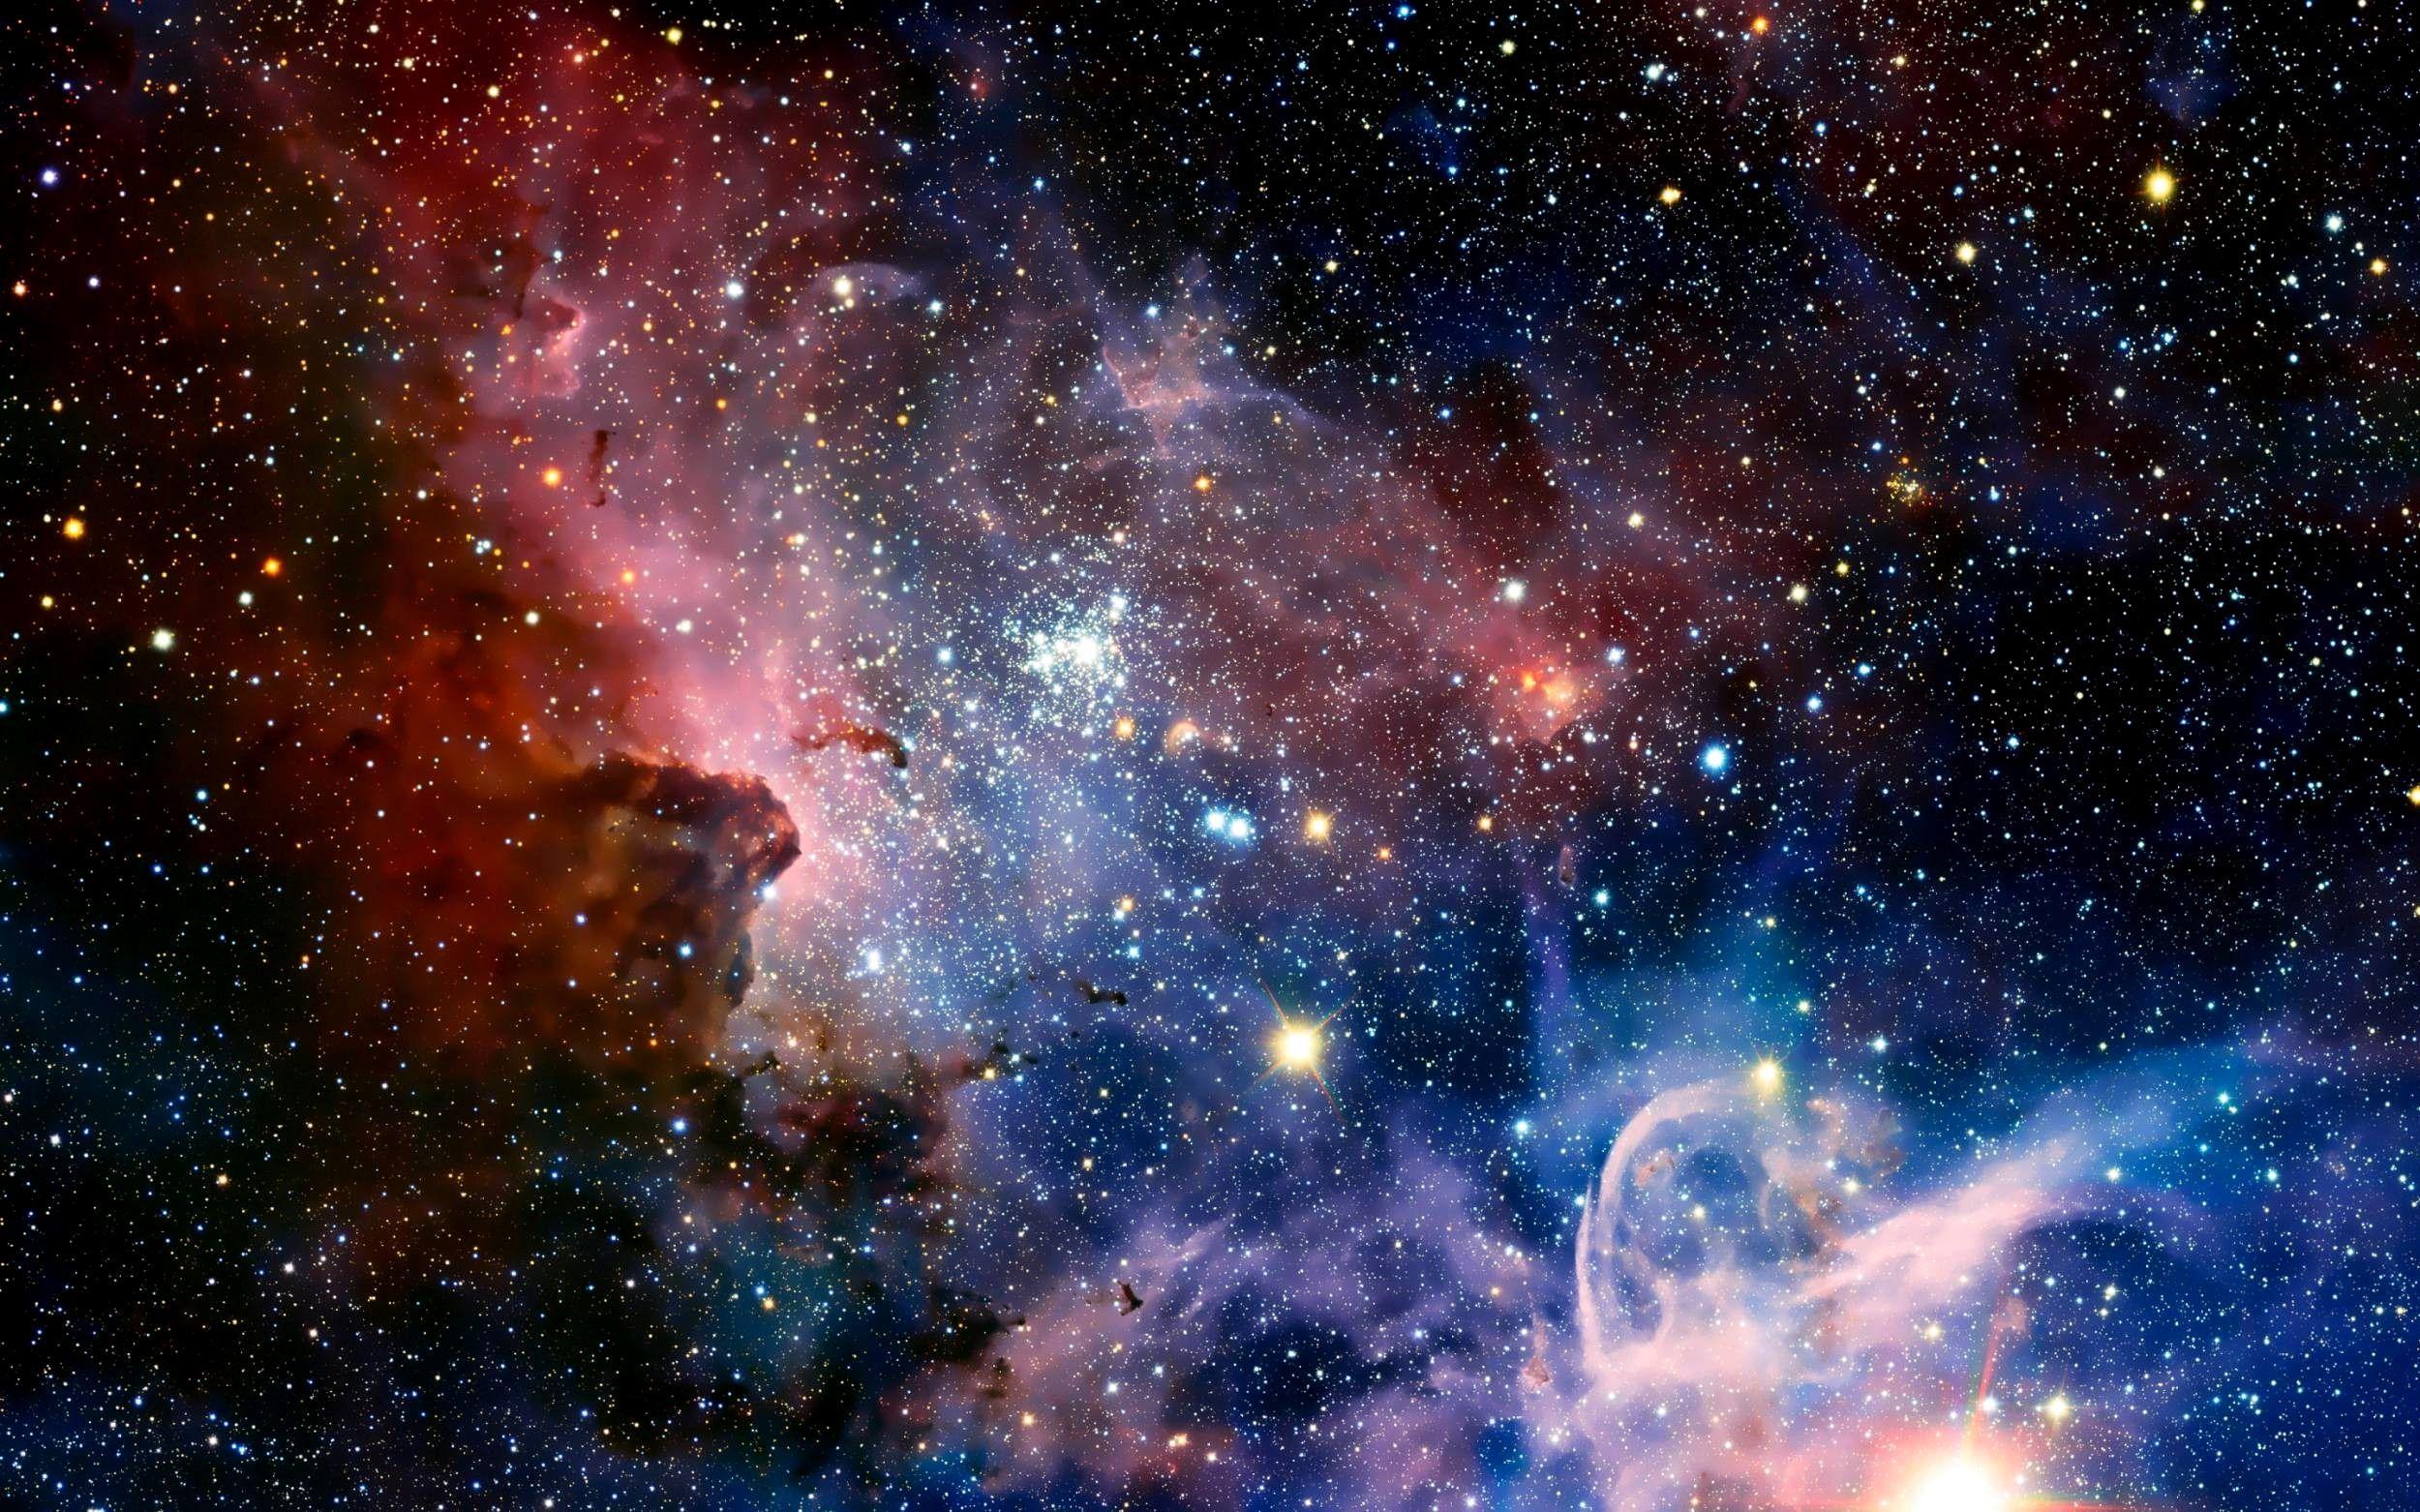 Wallpaper 4k Ultra Hd Universe Ideas Hd Galaxy Wallpaper Nebula Wallpaper Galaxy Wallpaper